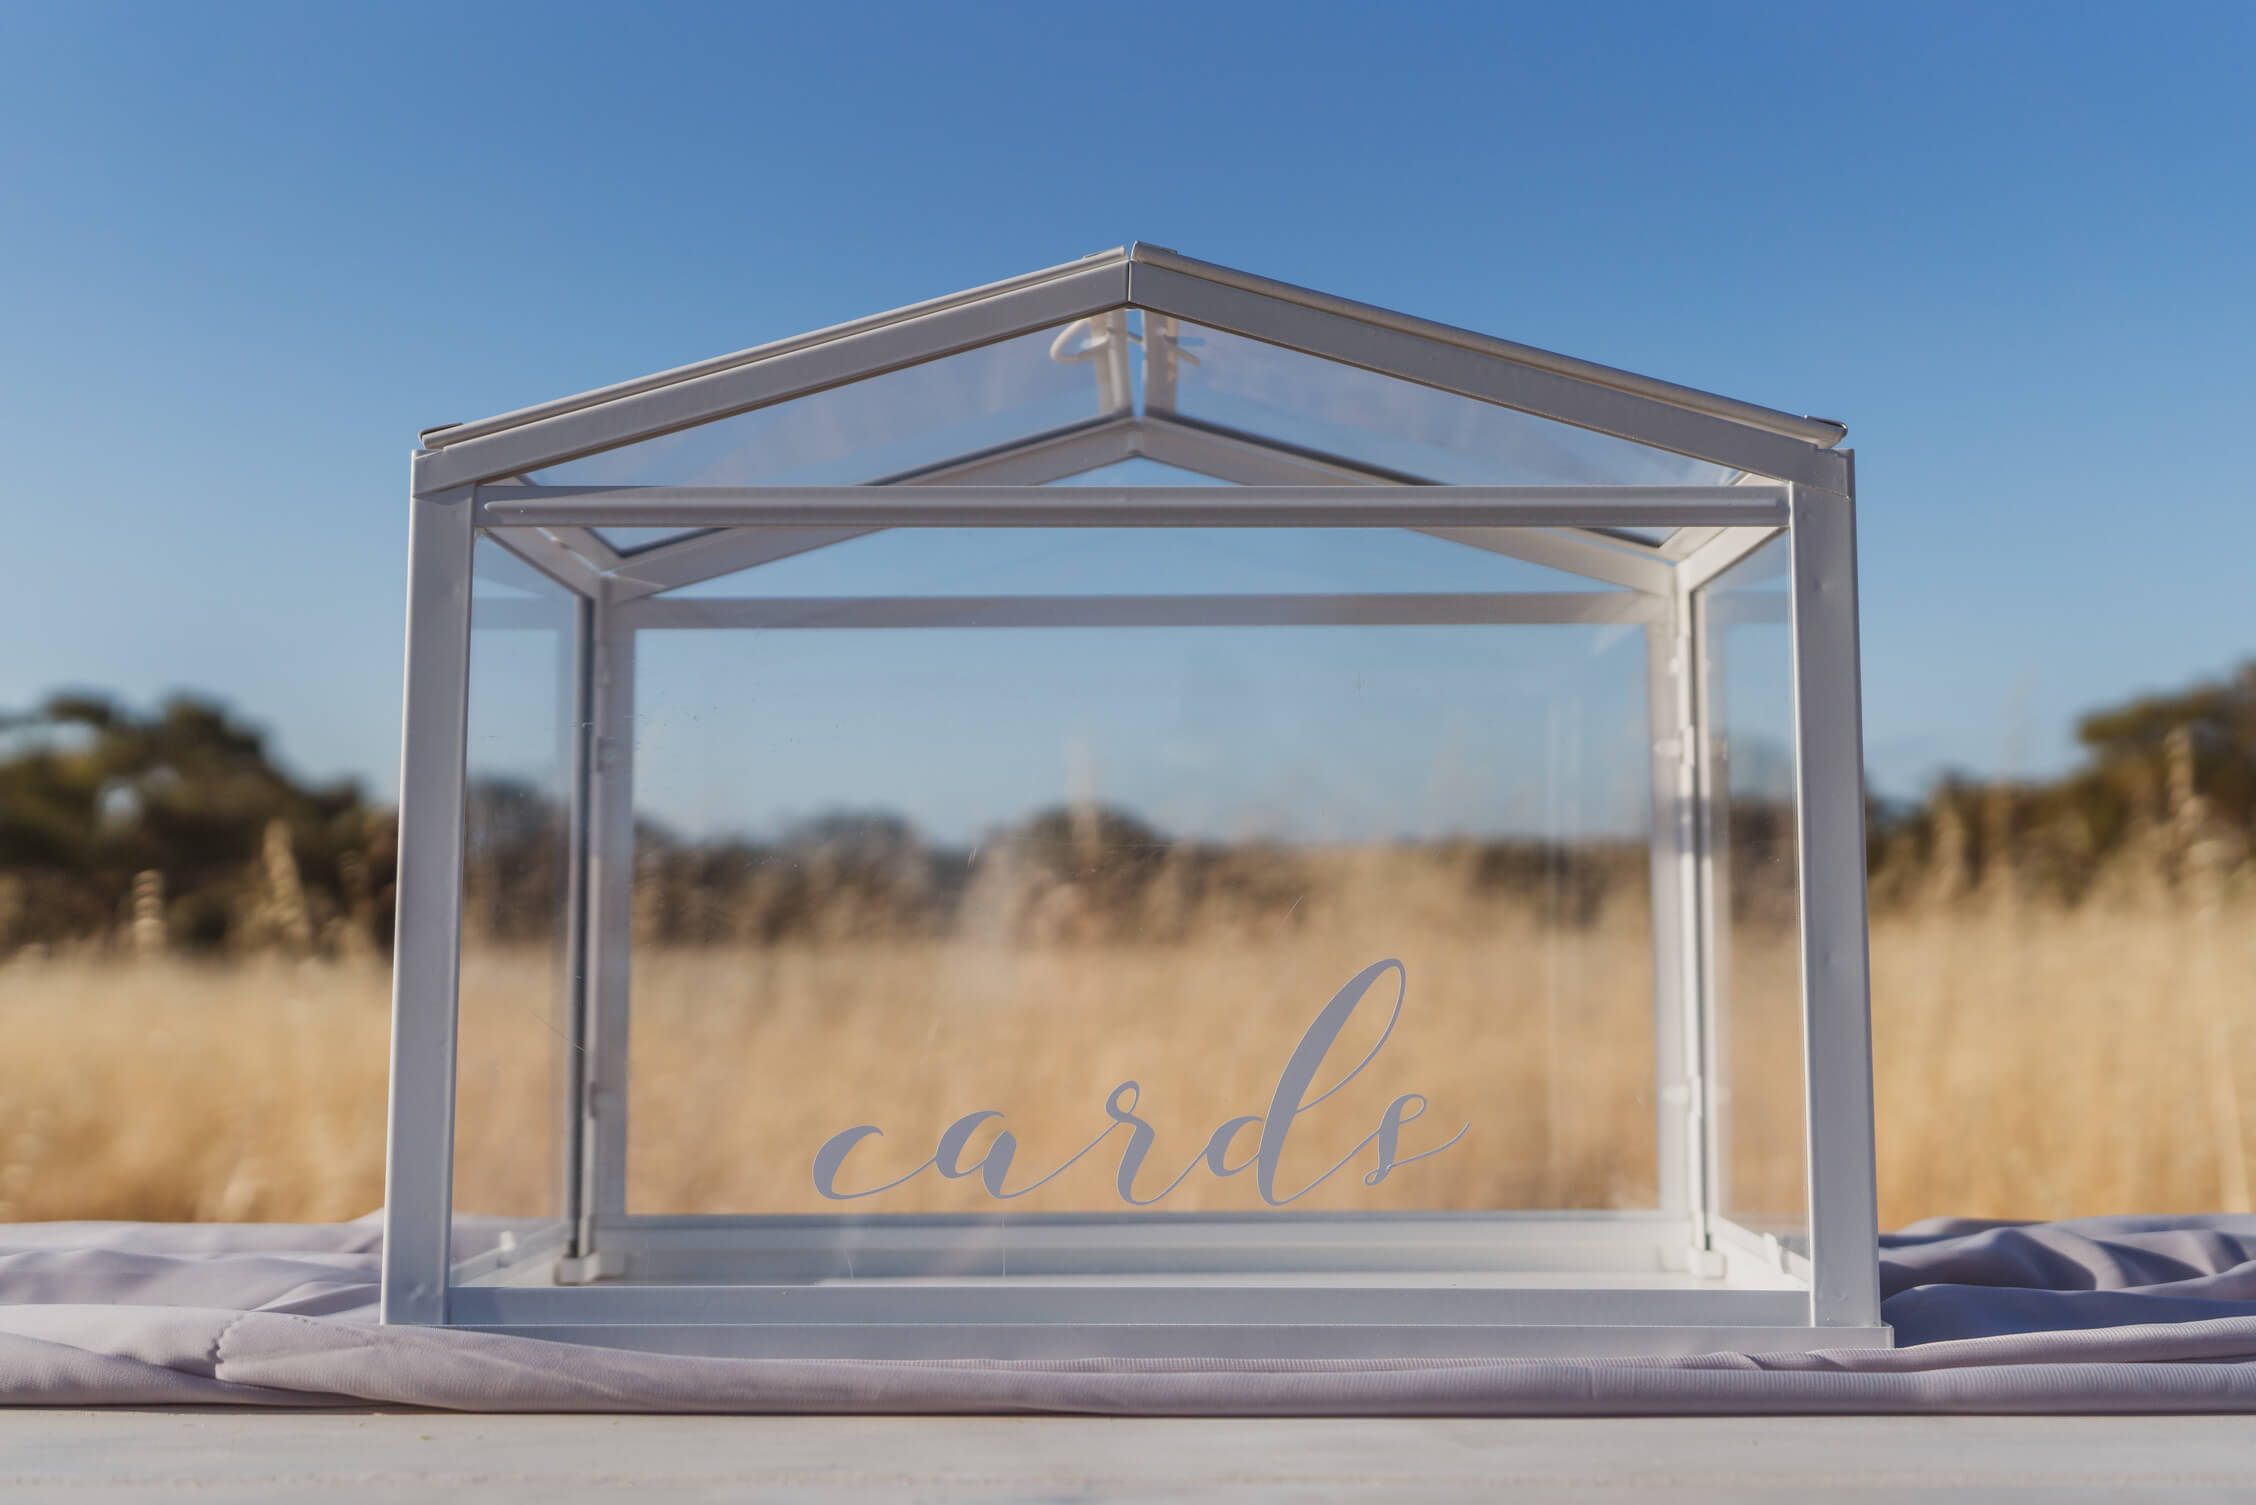 Greenhouse cards box